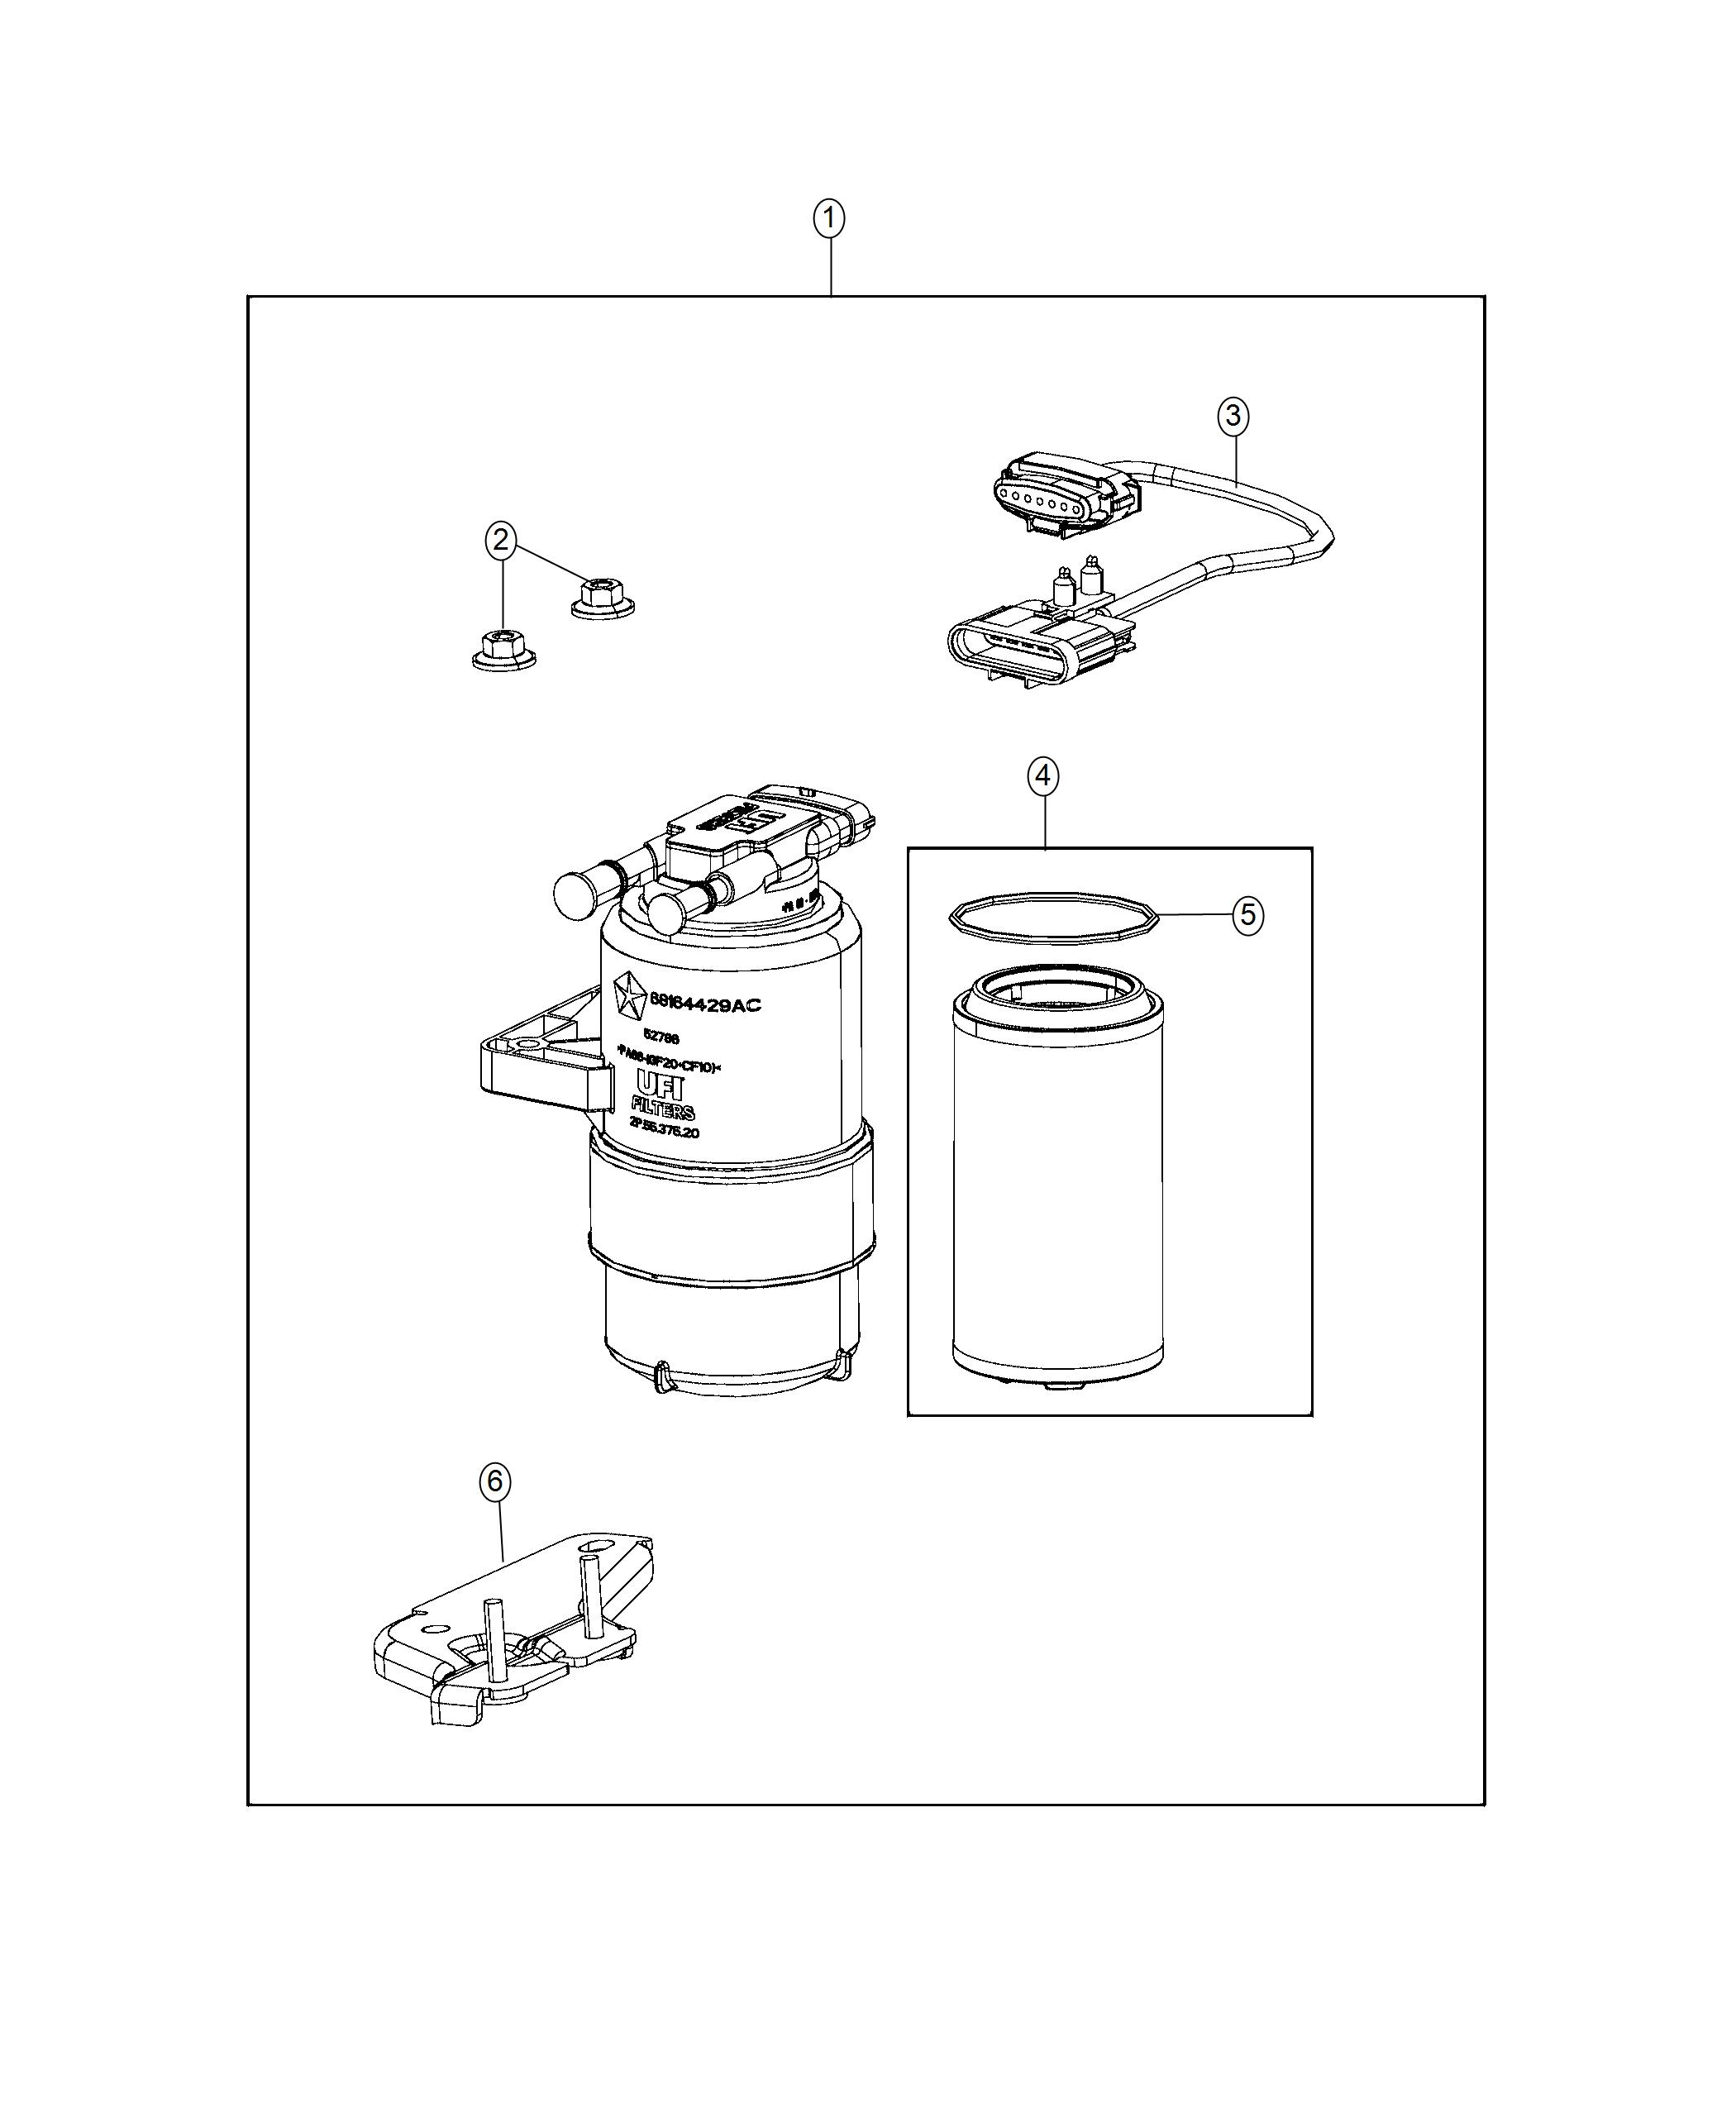 Ram Bracket Fuel Filter